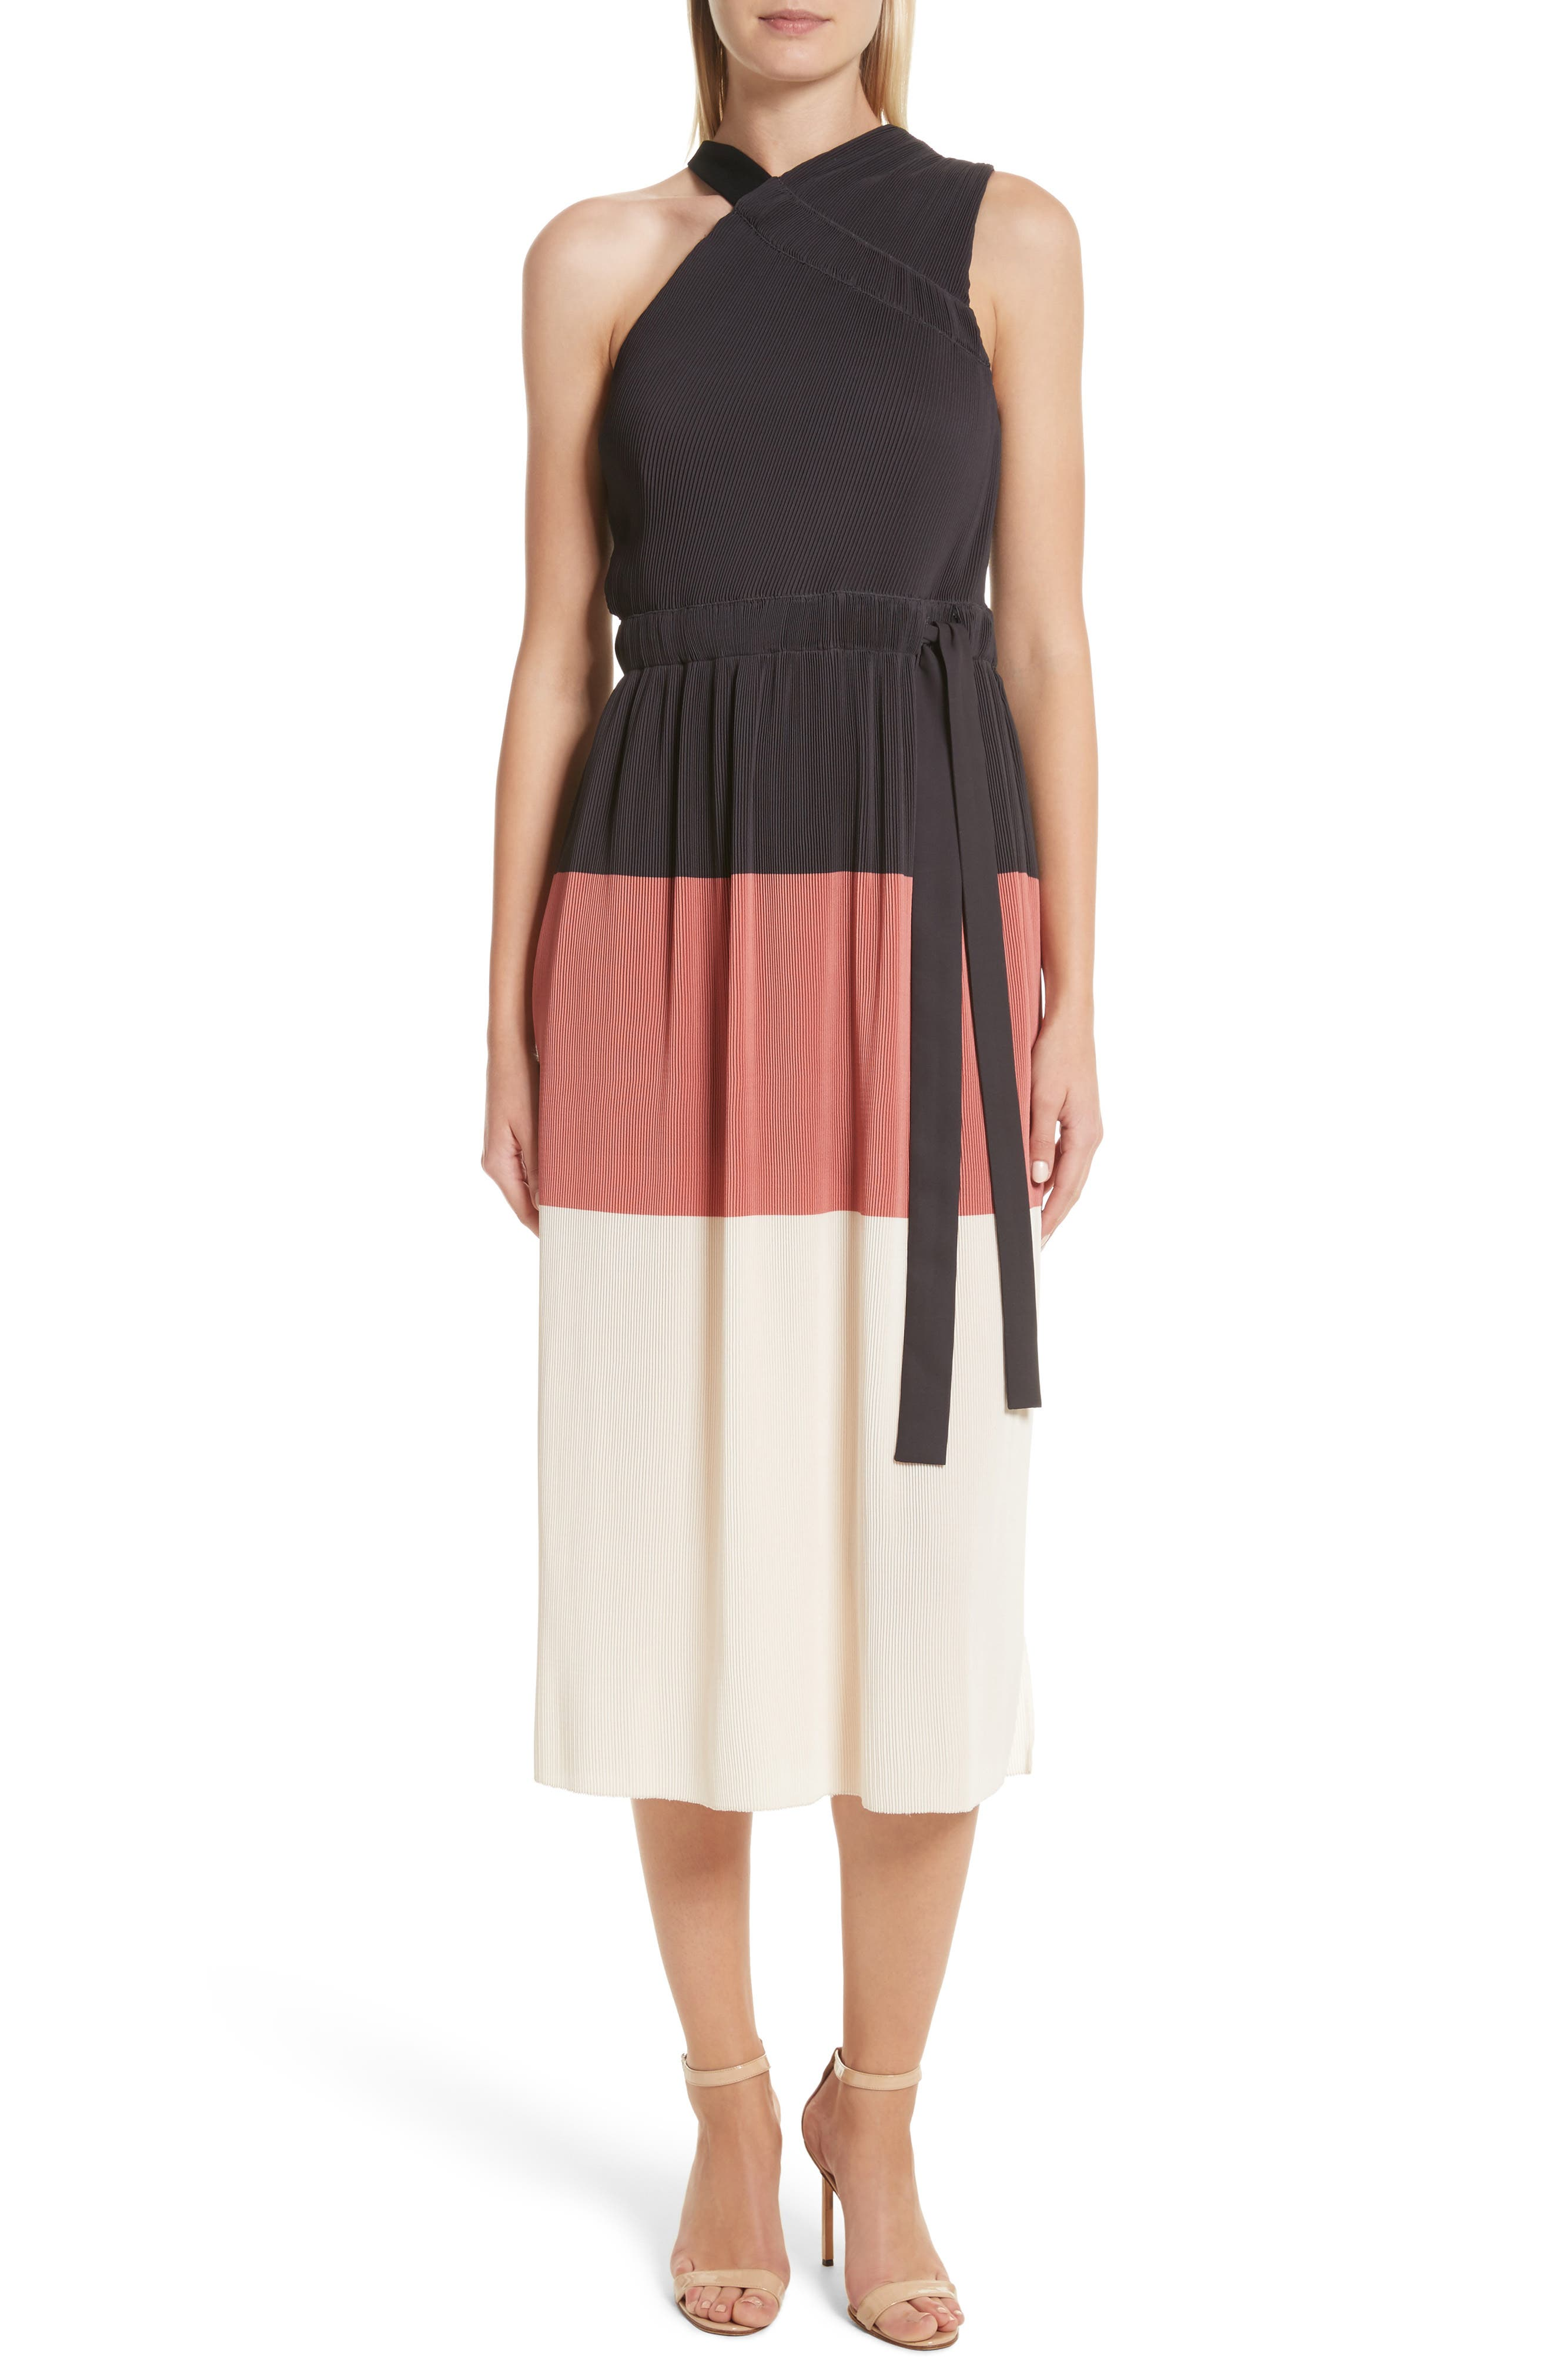 Derek Lam 10 Crosby Colorblock Pleated Dress